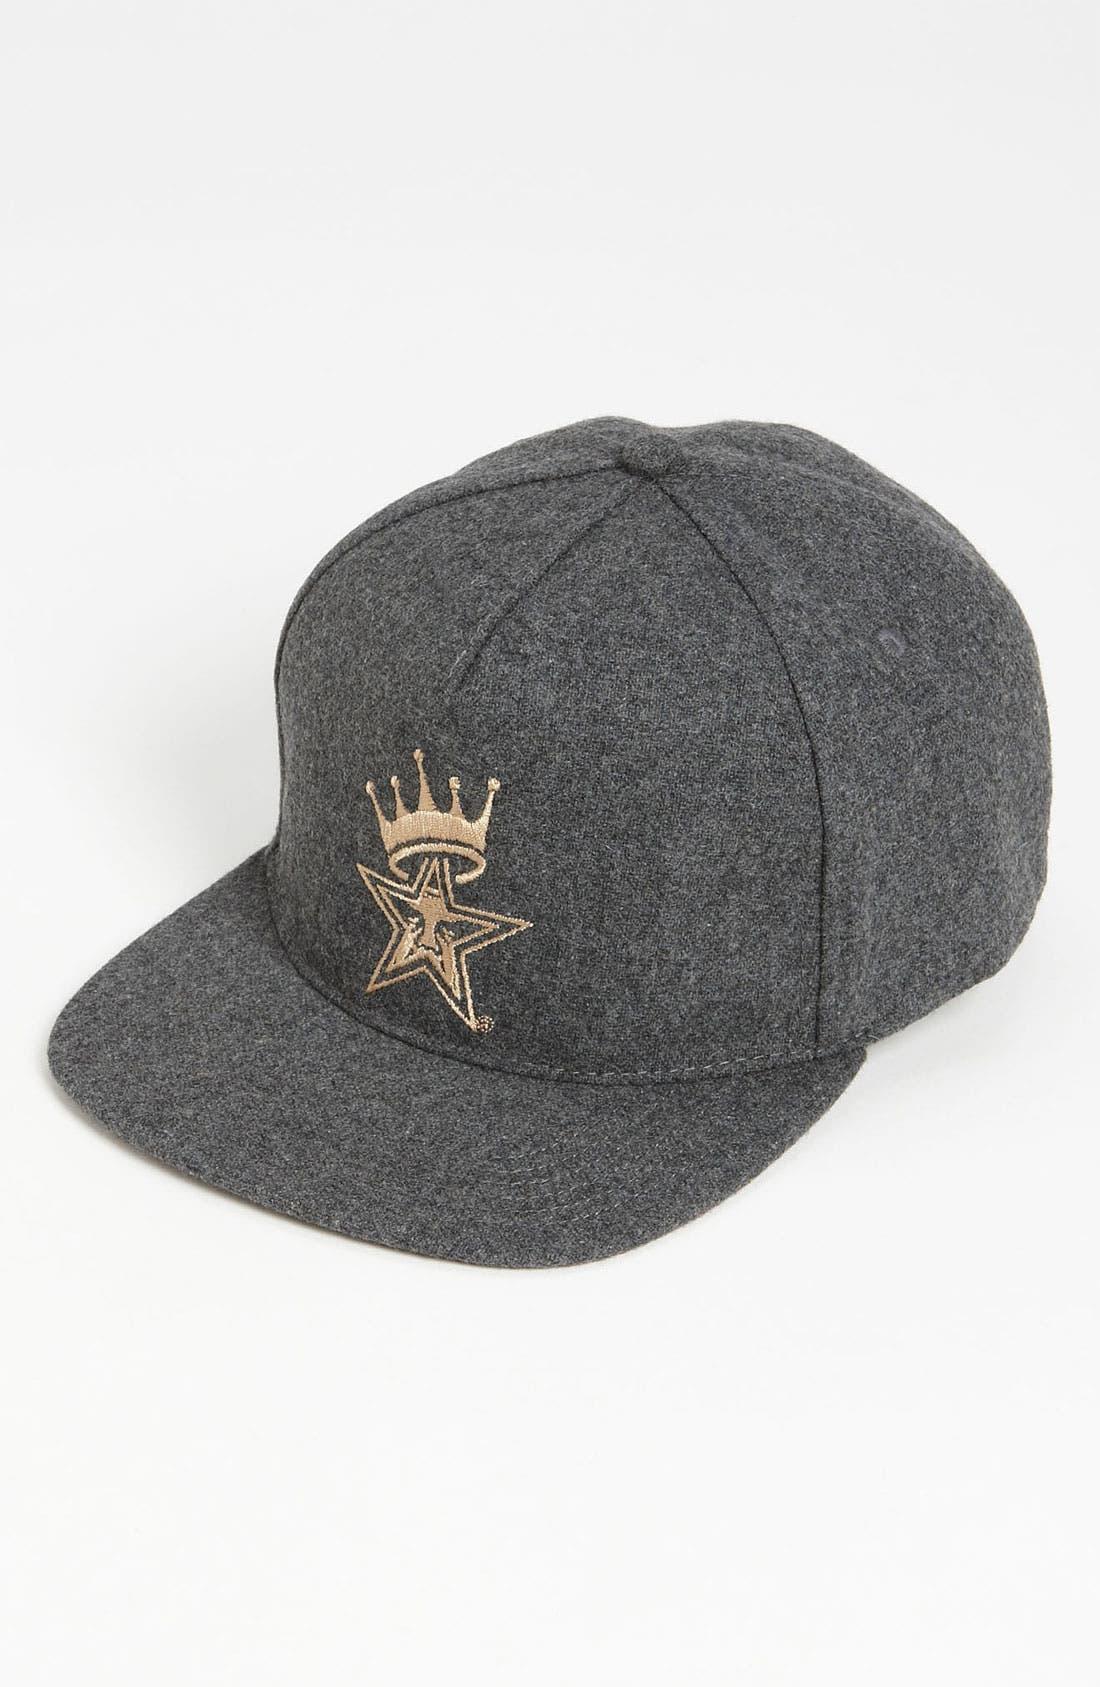 Alternate Image 1 Selected - Obey 'Crowned' Snapback Baseball Cap